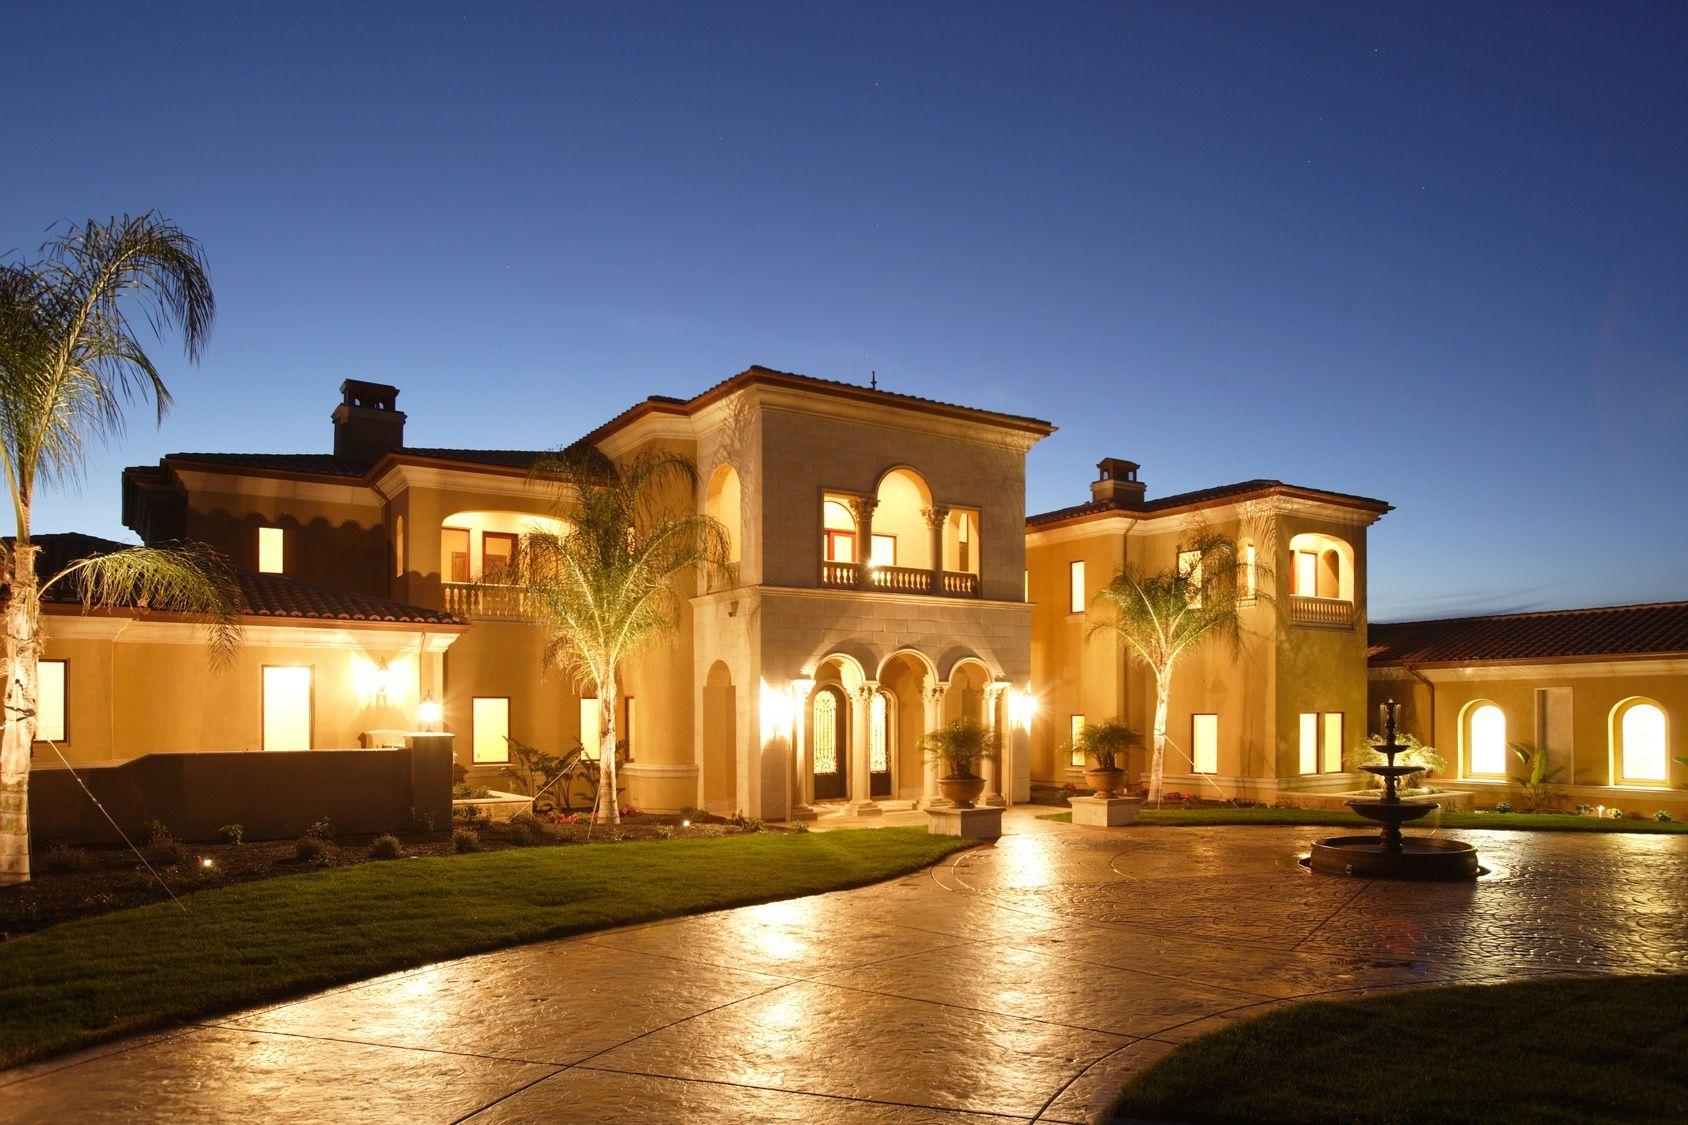 Tampa Luxury Homes Luxury Homes Dream Houses San Diego Houses